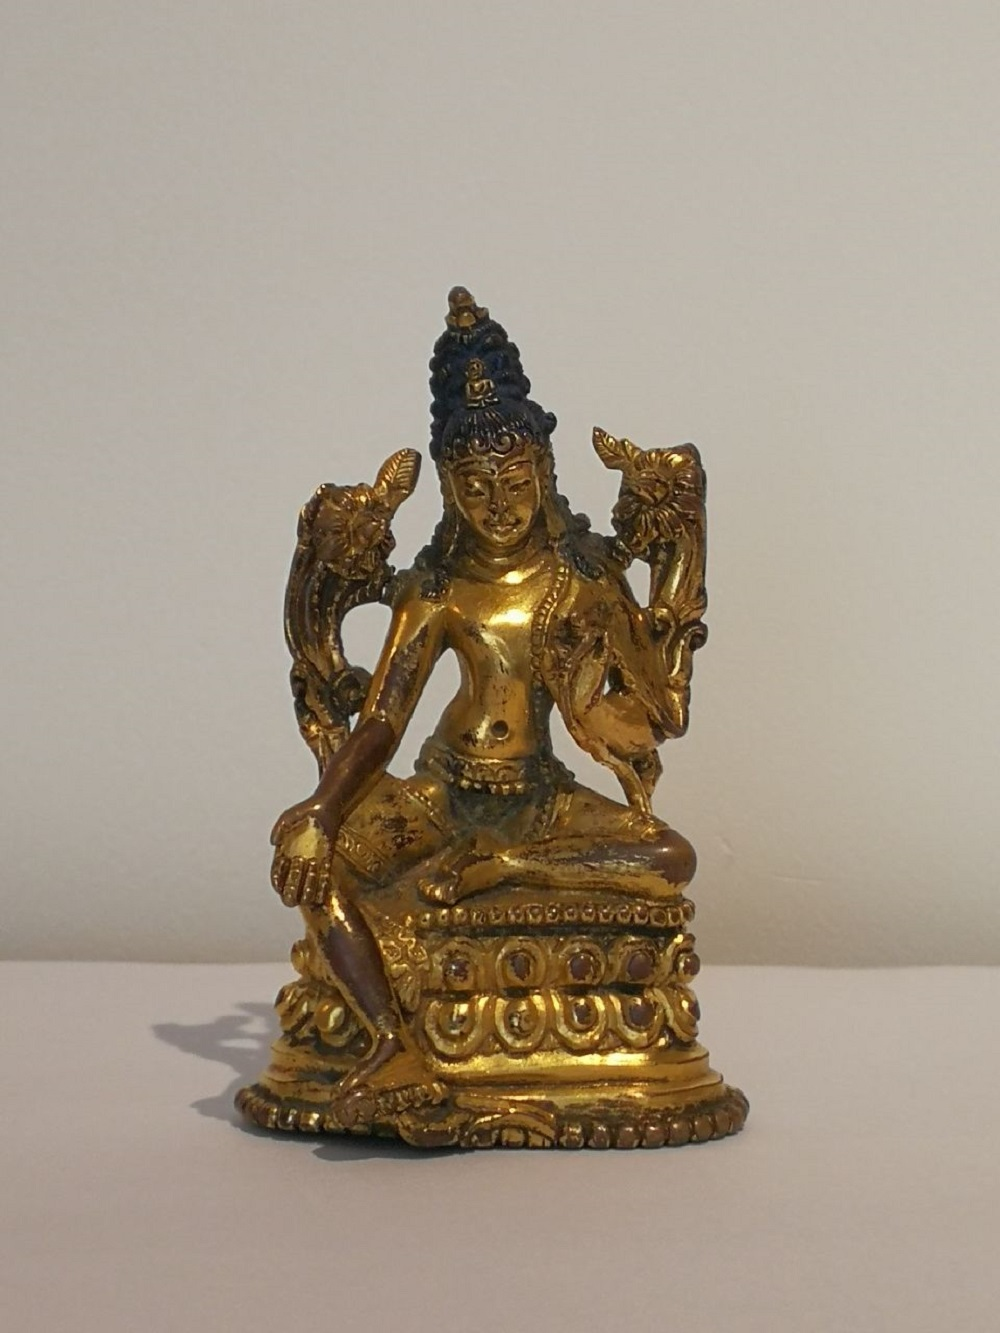 A 19th C Gilt-Bronze Tibetan Buddha Statue